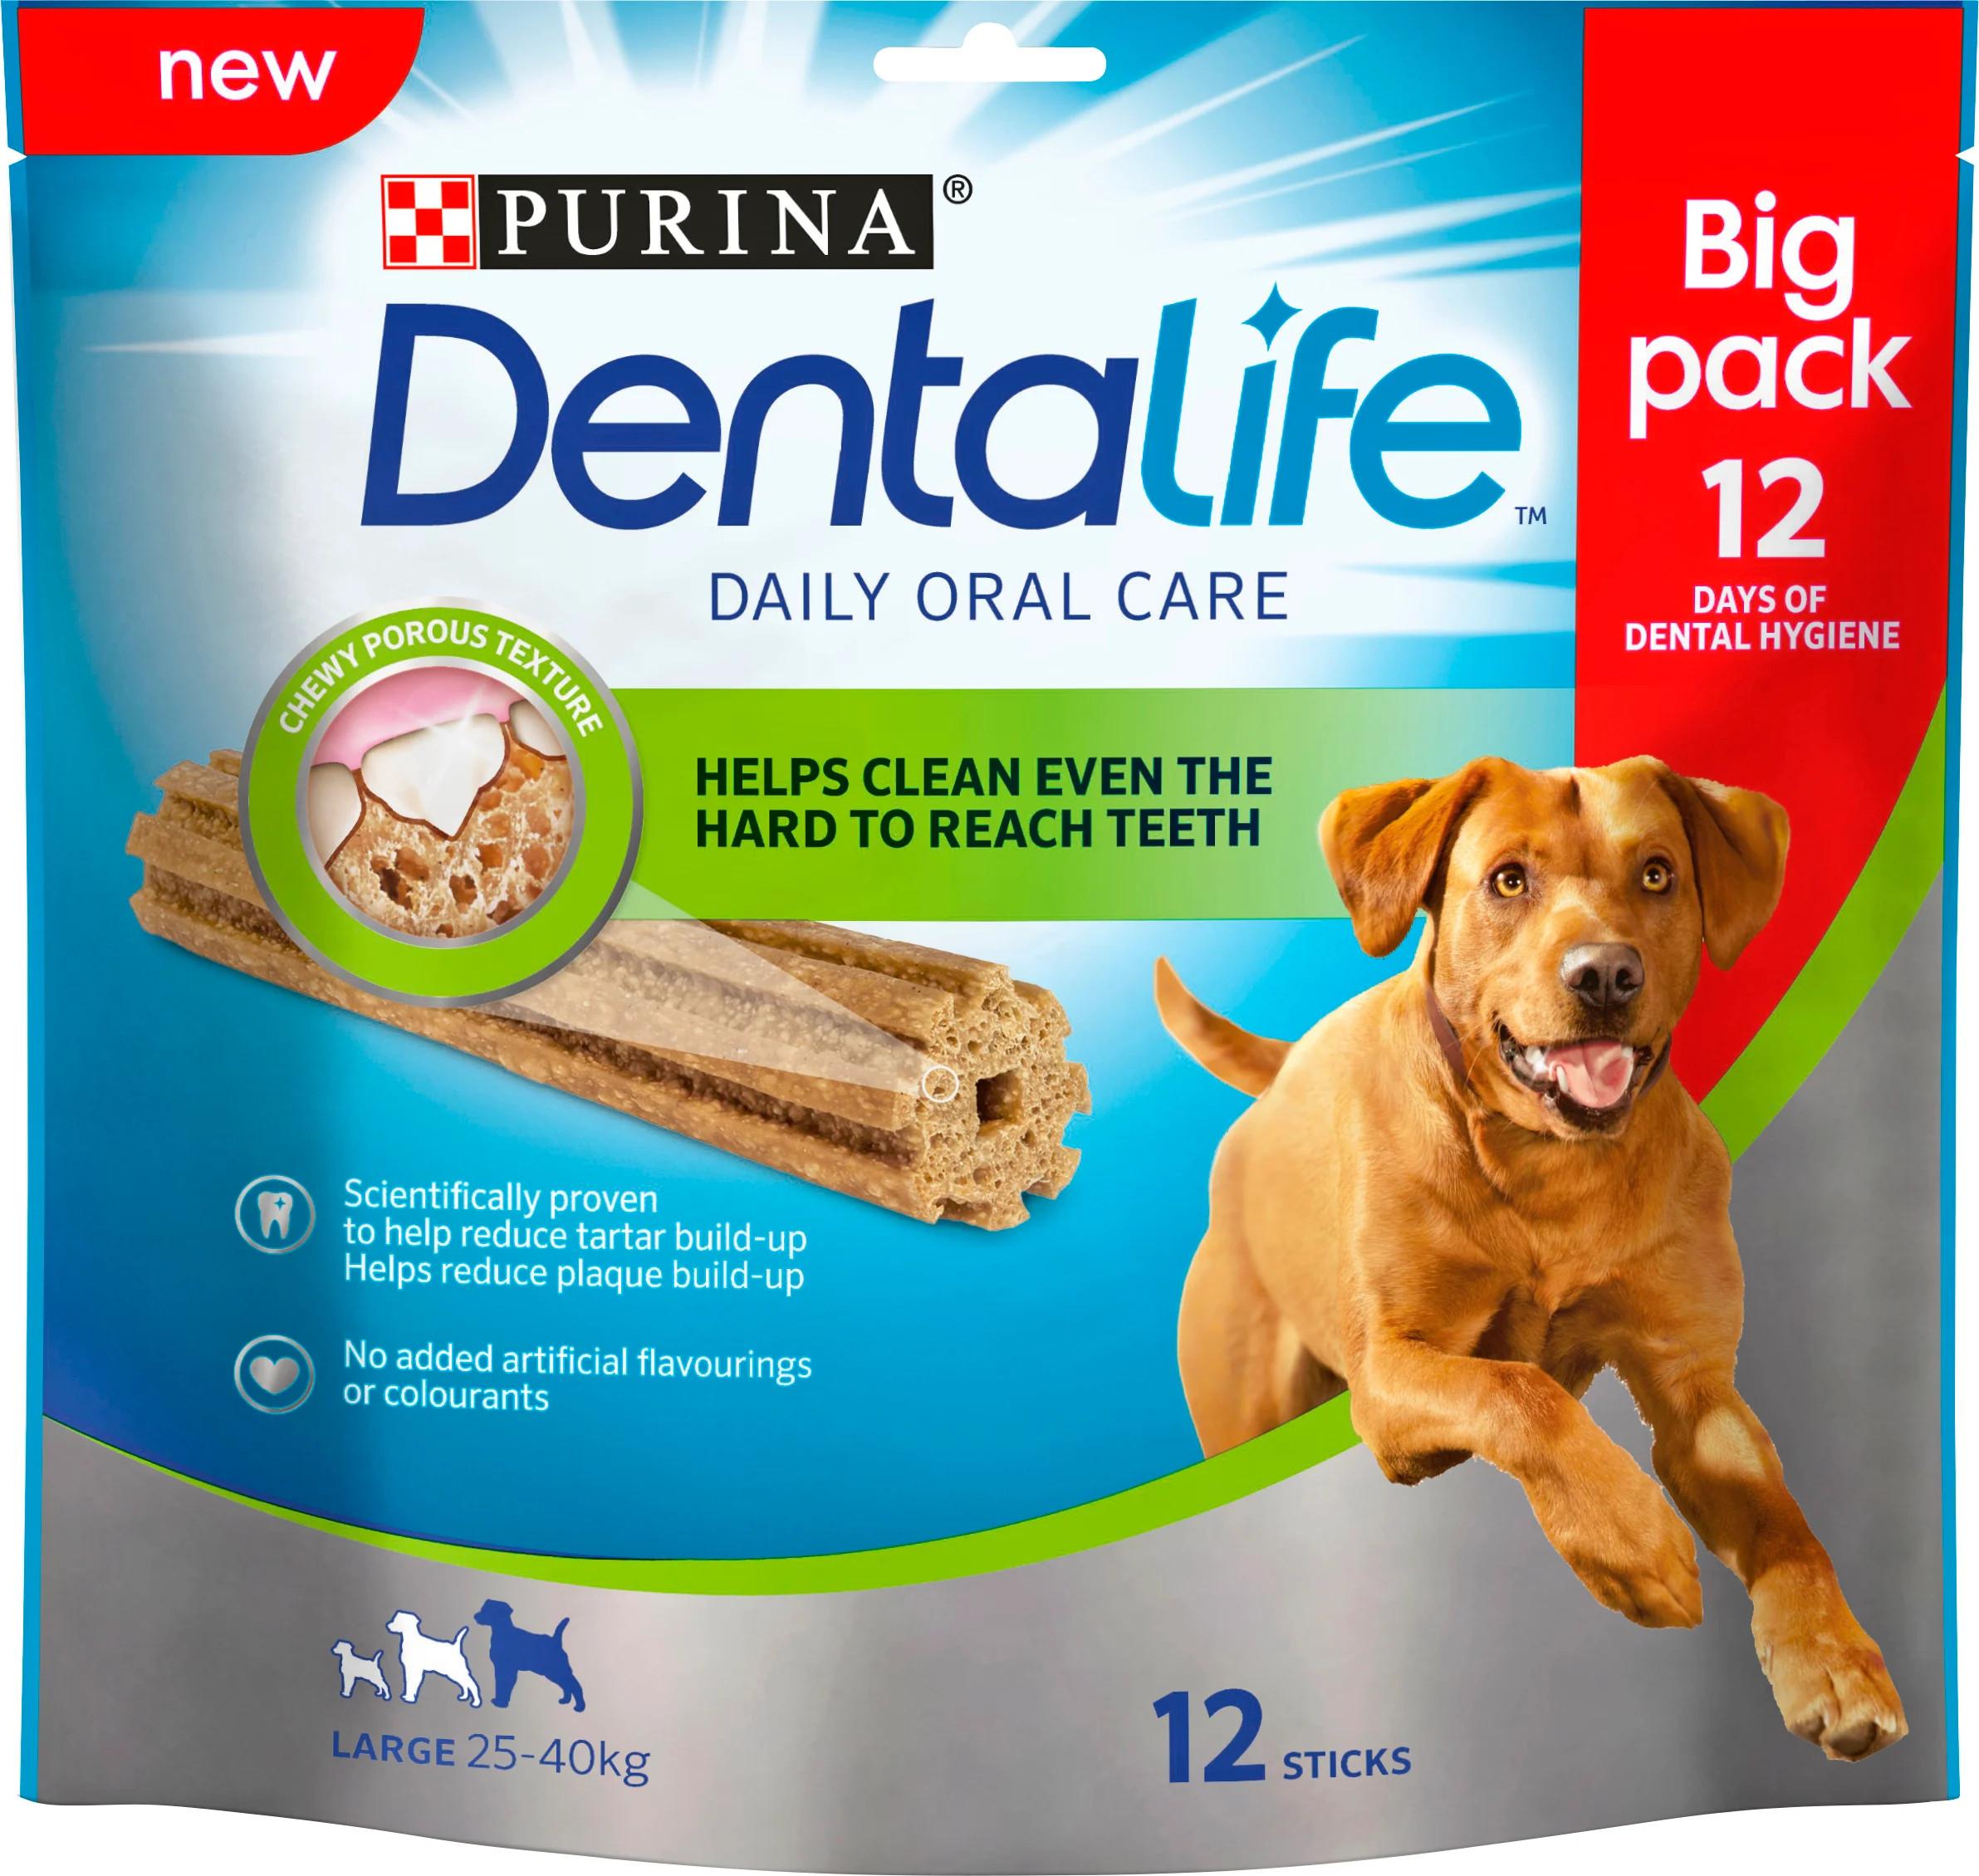 Dentalife tuggpinne Large - 1 påse, 12 st tuggpinnar